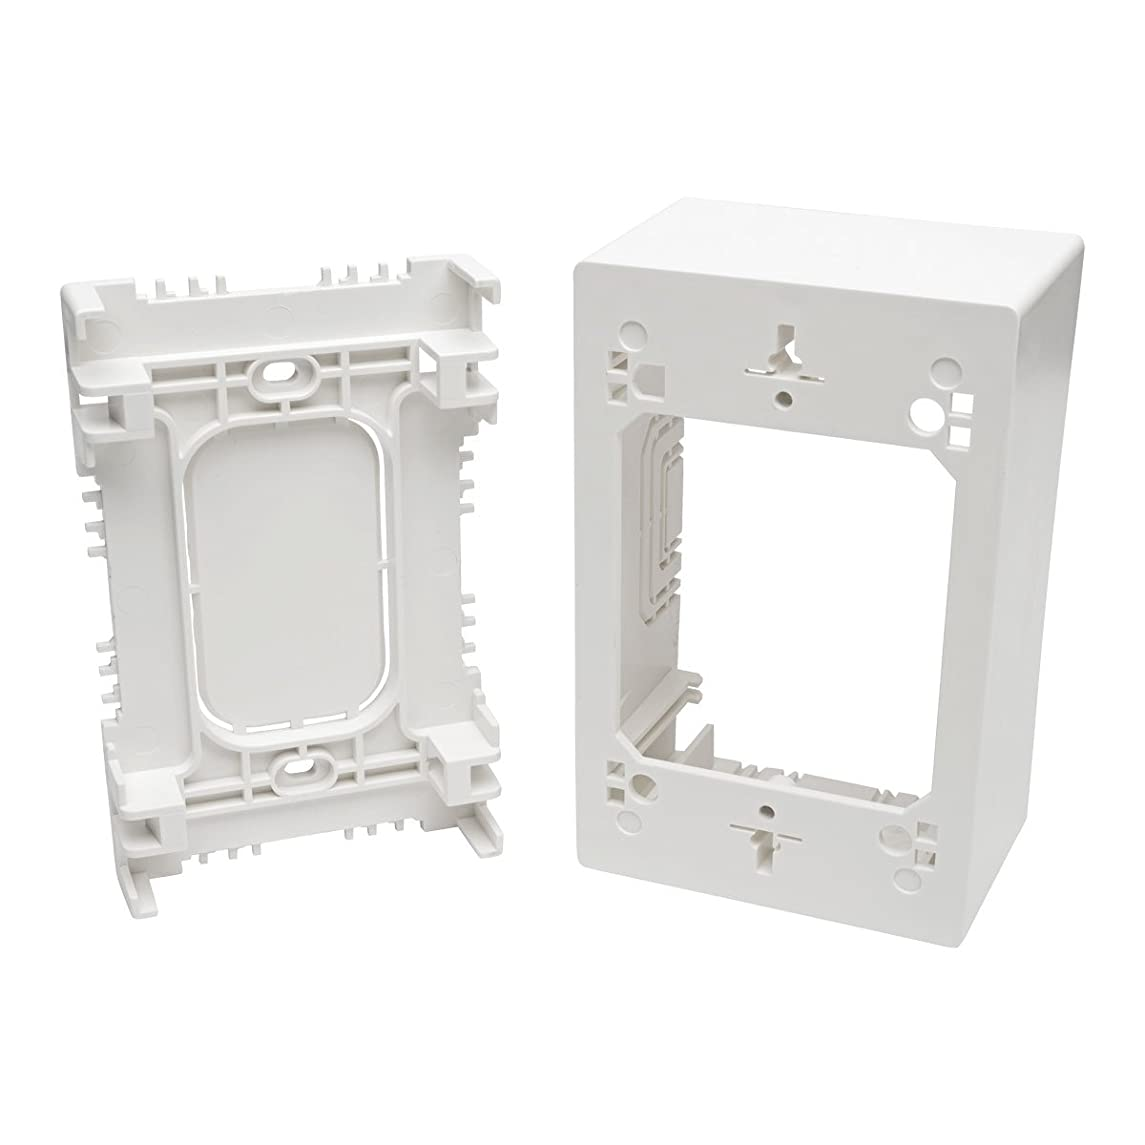 Tripp Lite Single-Gang Surface-Mount Junction Box, Wallplate, White (N080-SMB1-WH)